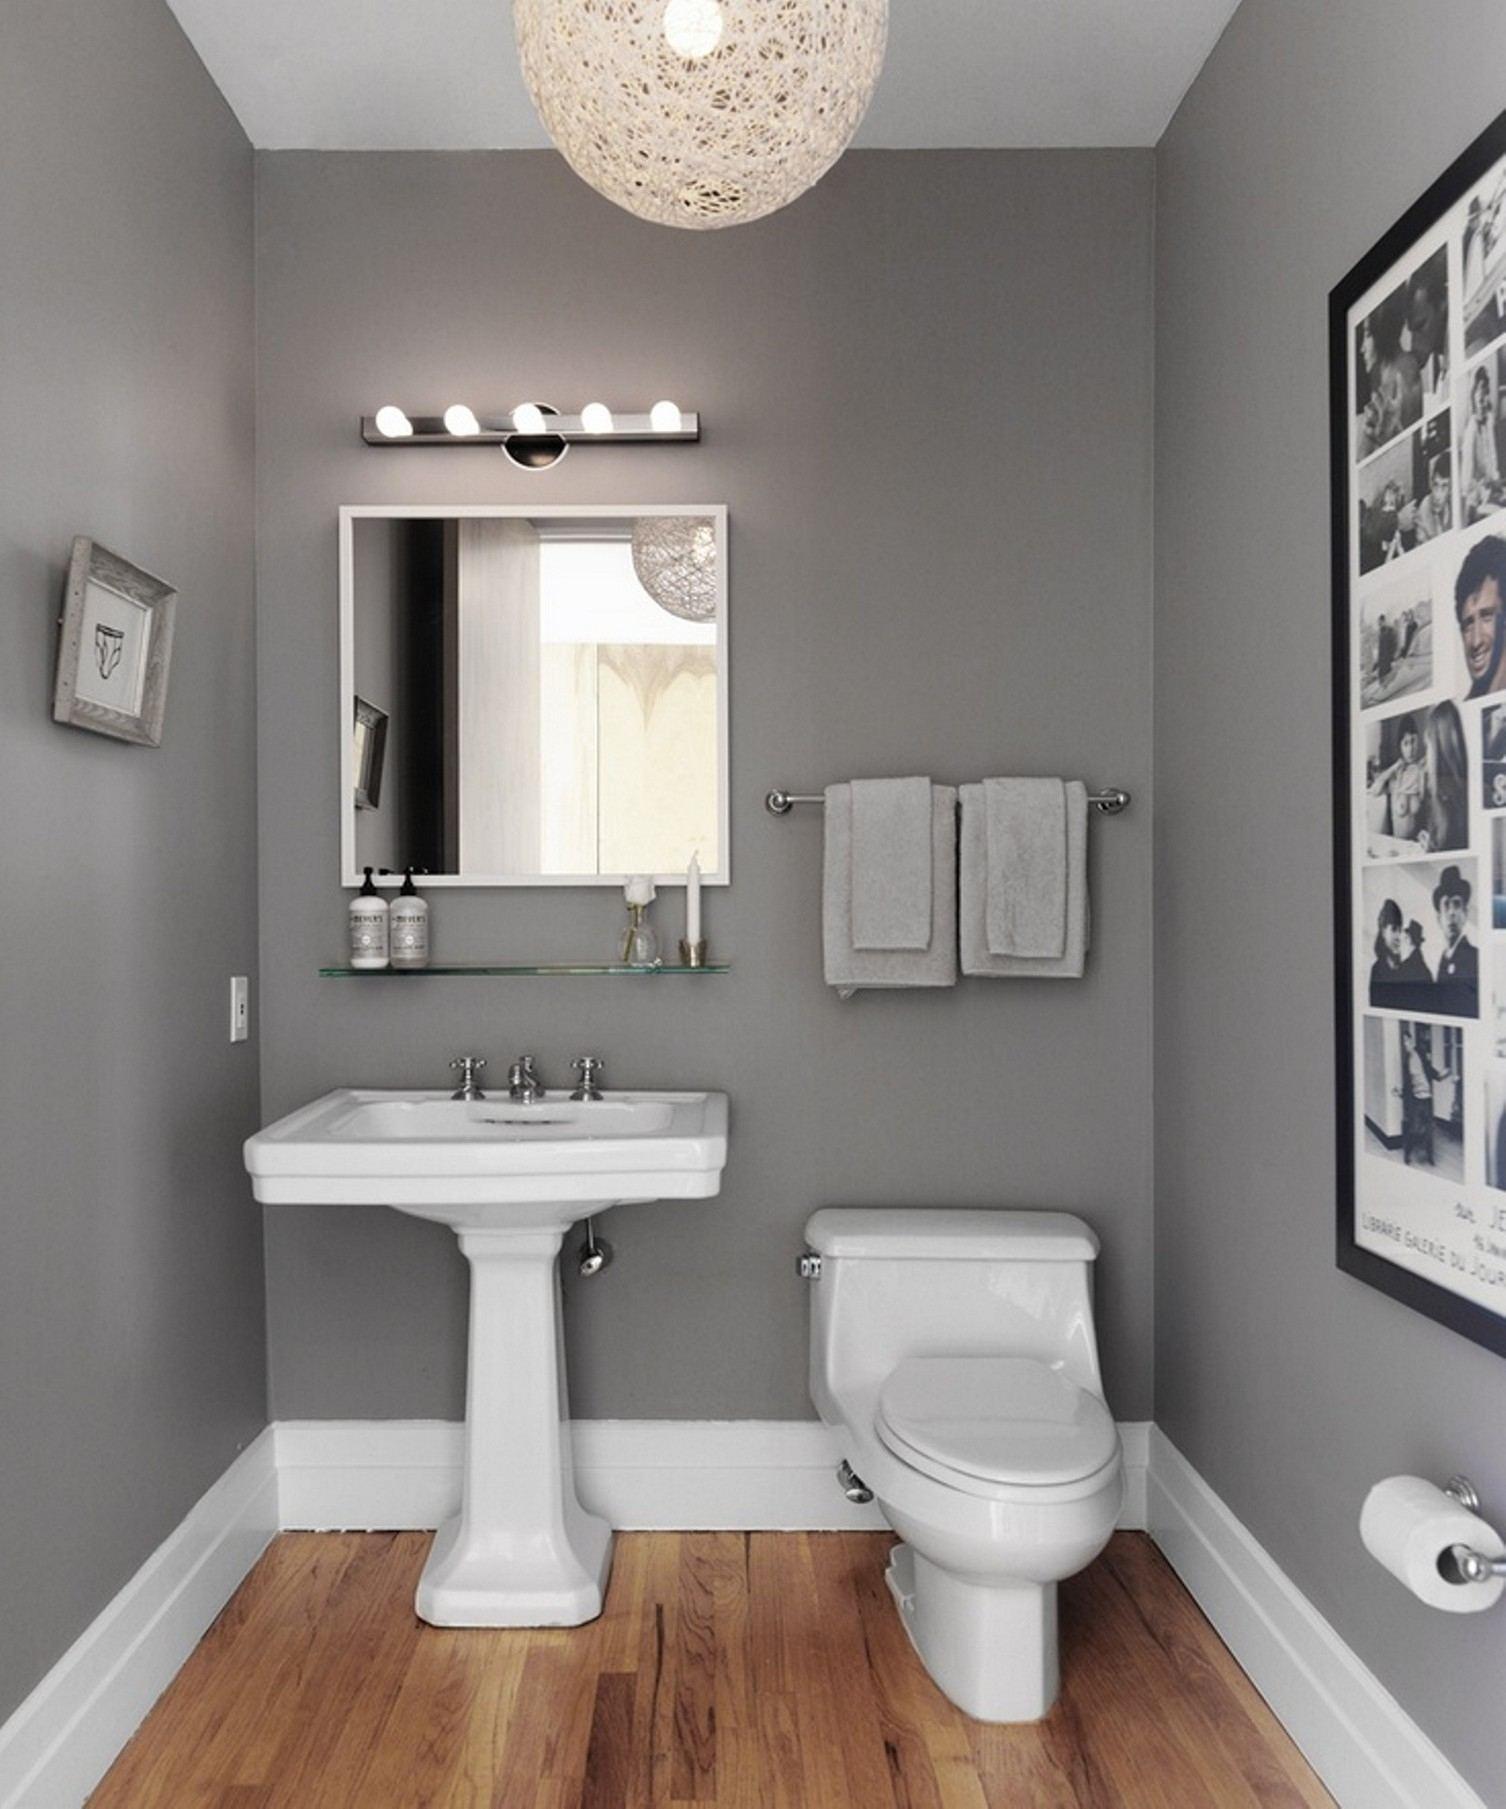 gray bathroom ideas gray bathrooms gray bathroom decor best small bathroom decorating ideas on bathroom charming